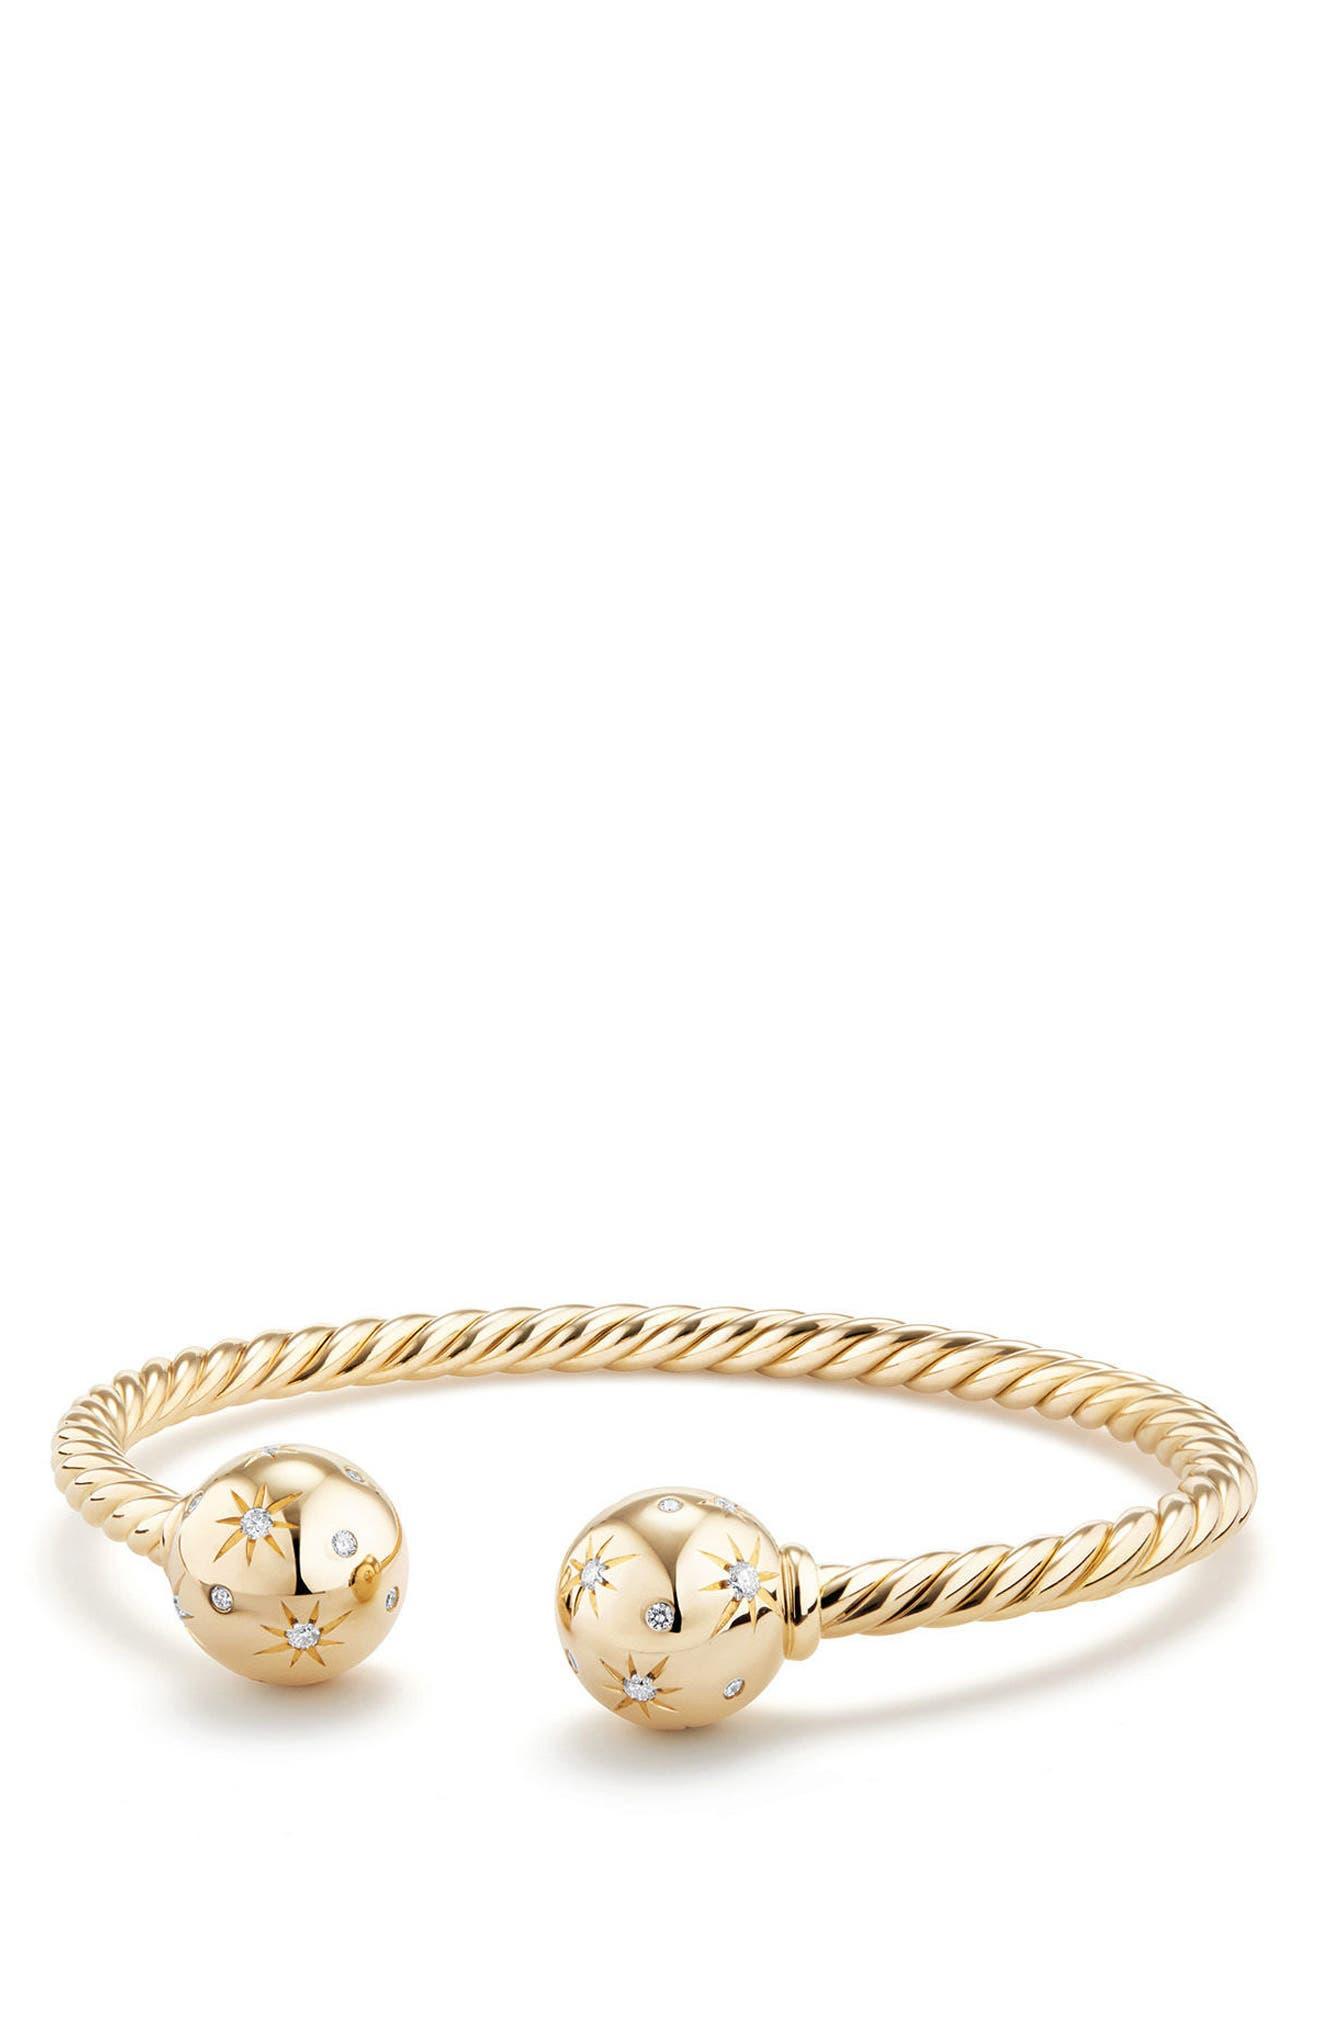 Solari Bead Bracelet with Diamonds in 18K Gold,                         Main,                         color, Yellow Gold